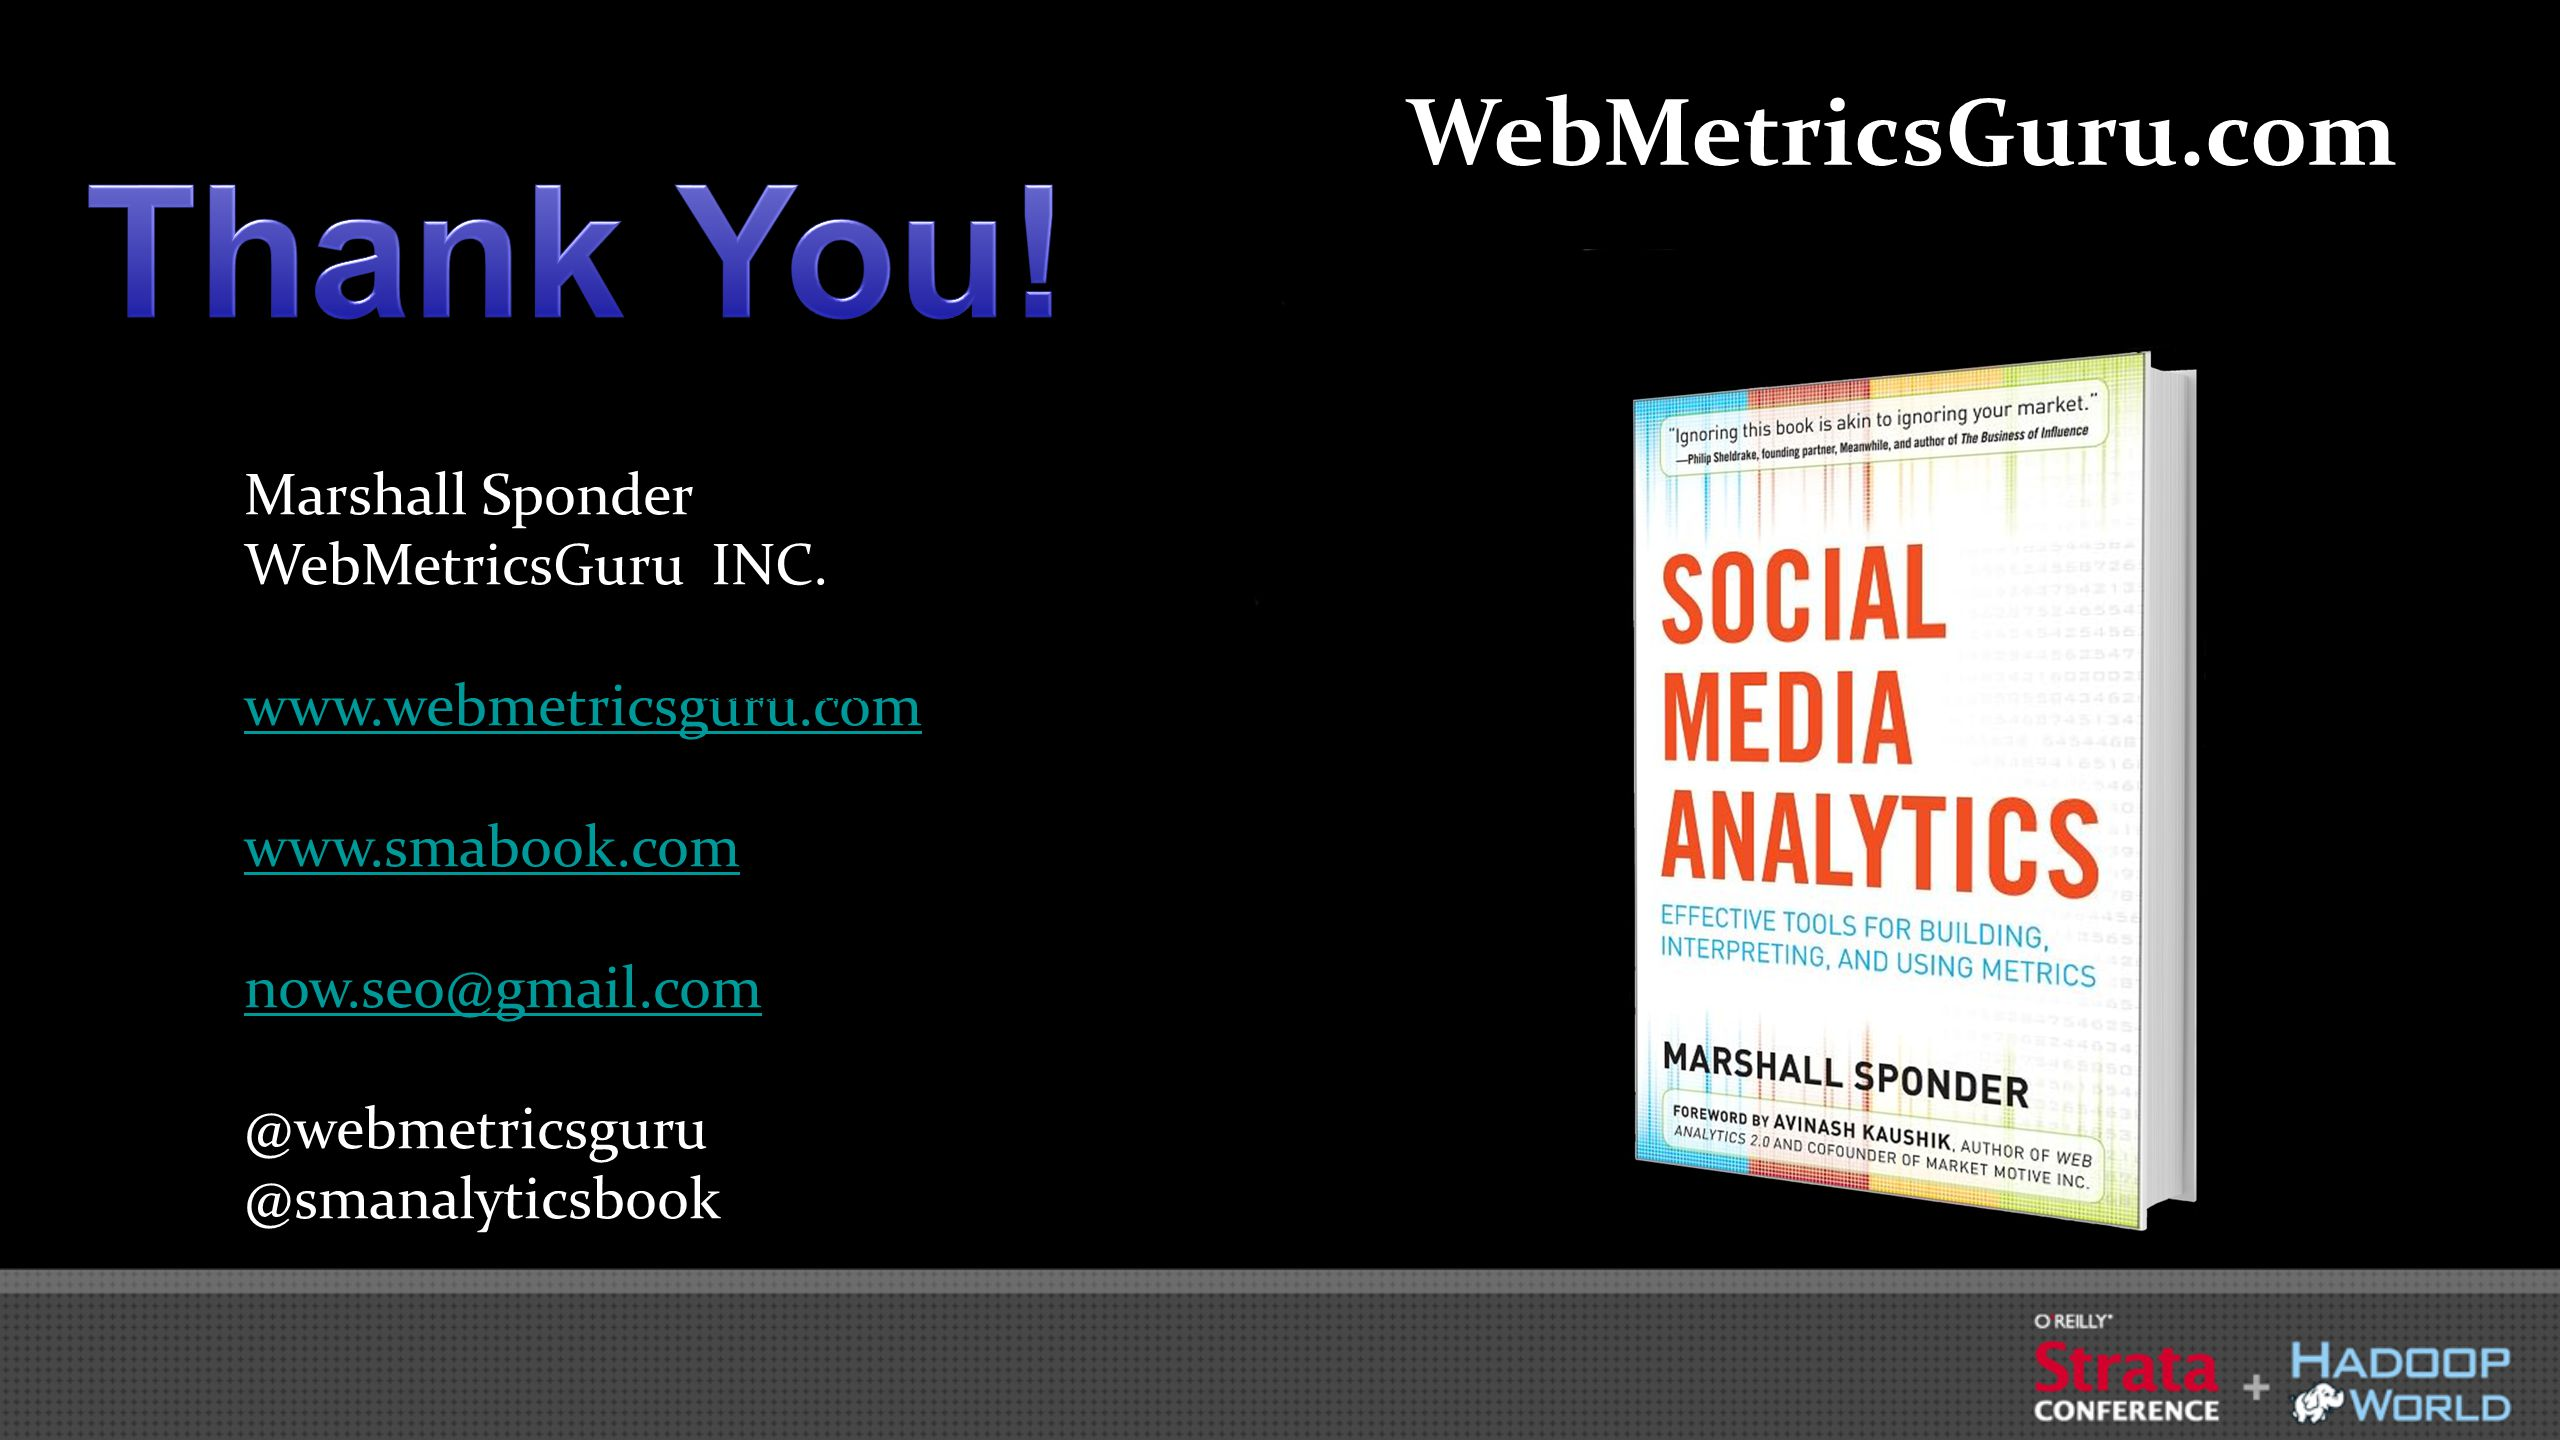 Marshall Sponder WebMetricsGuru INC.